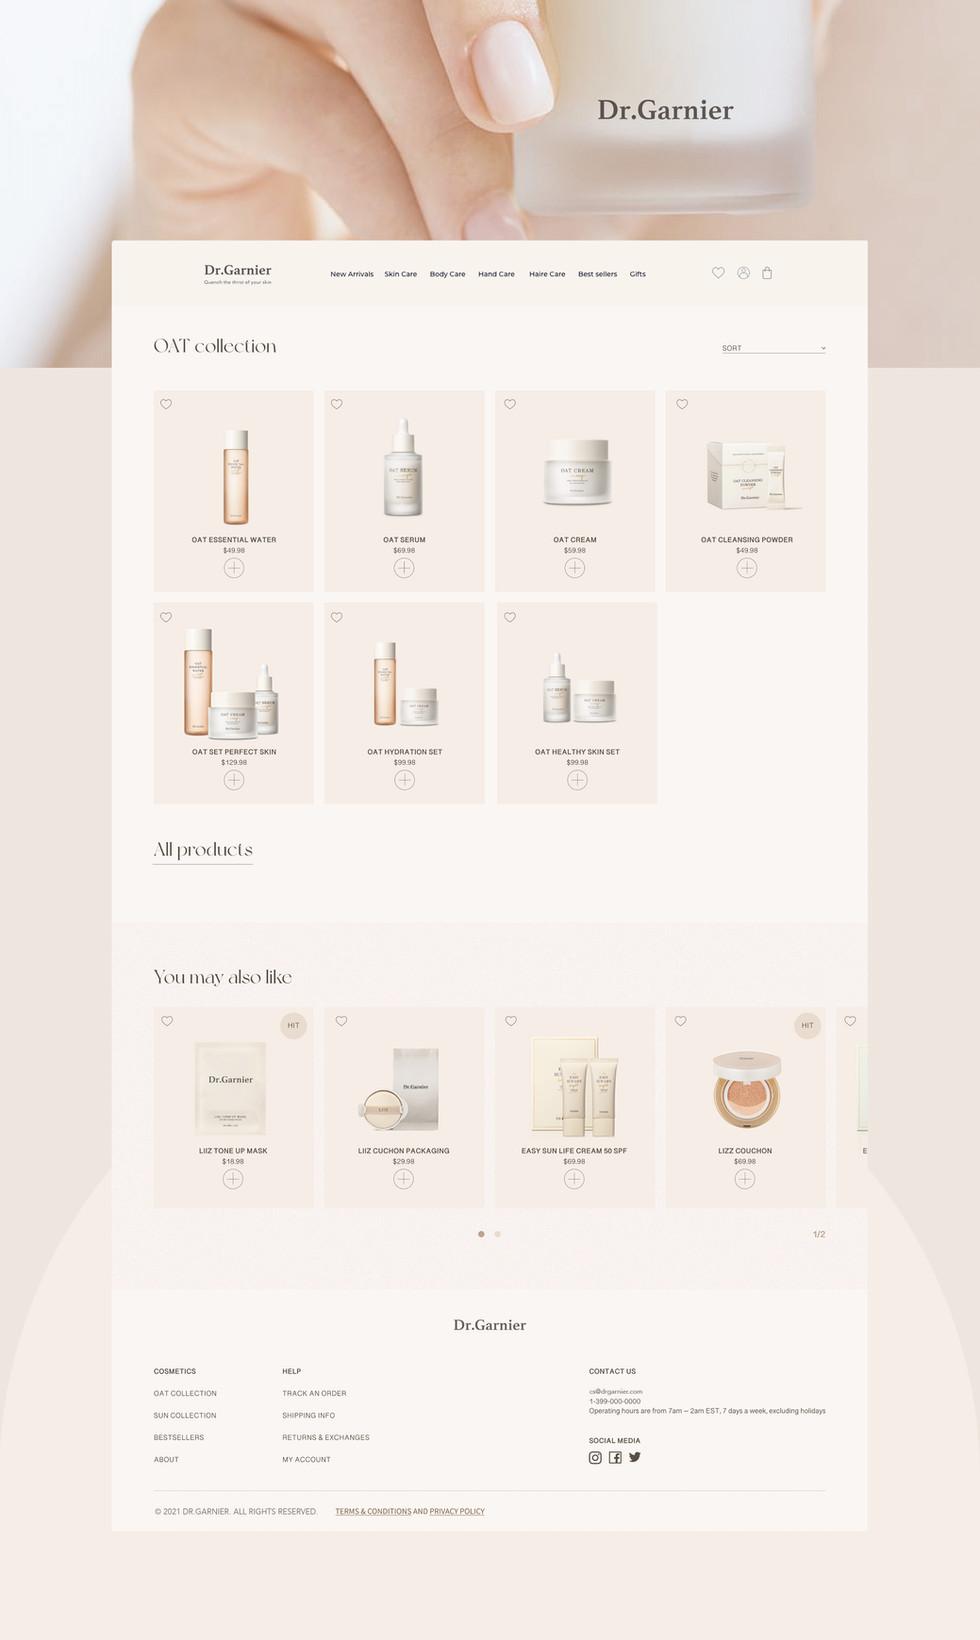 DR. Garnier Cosmetic Website Design3.jpg